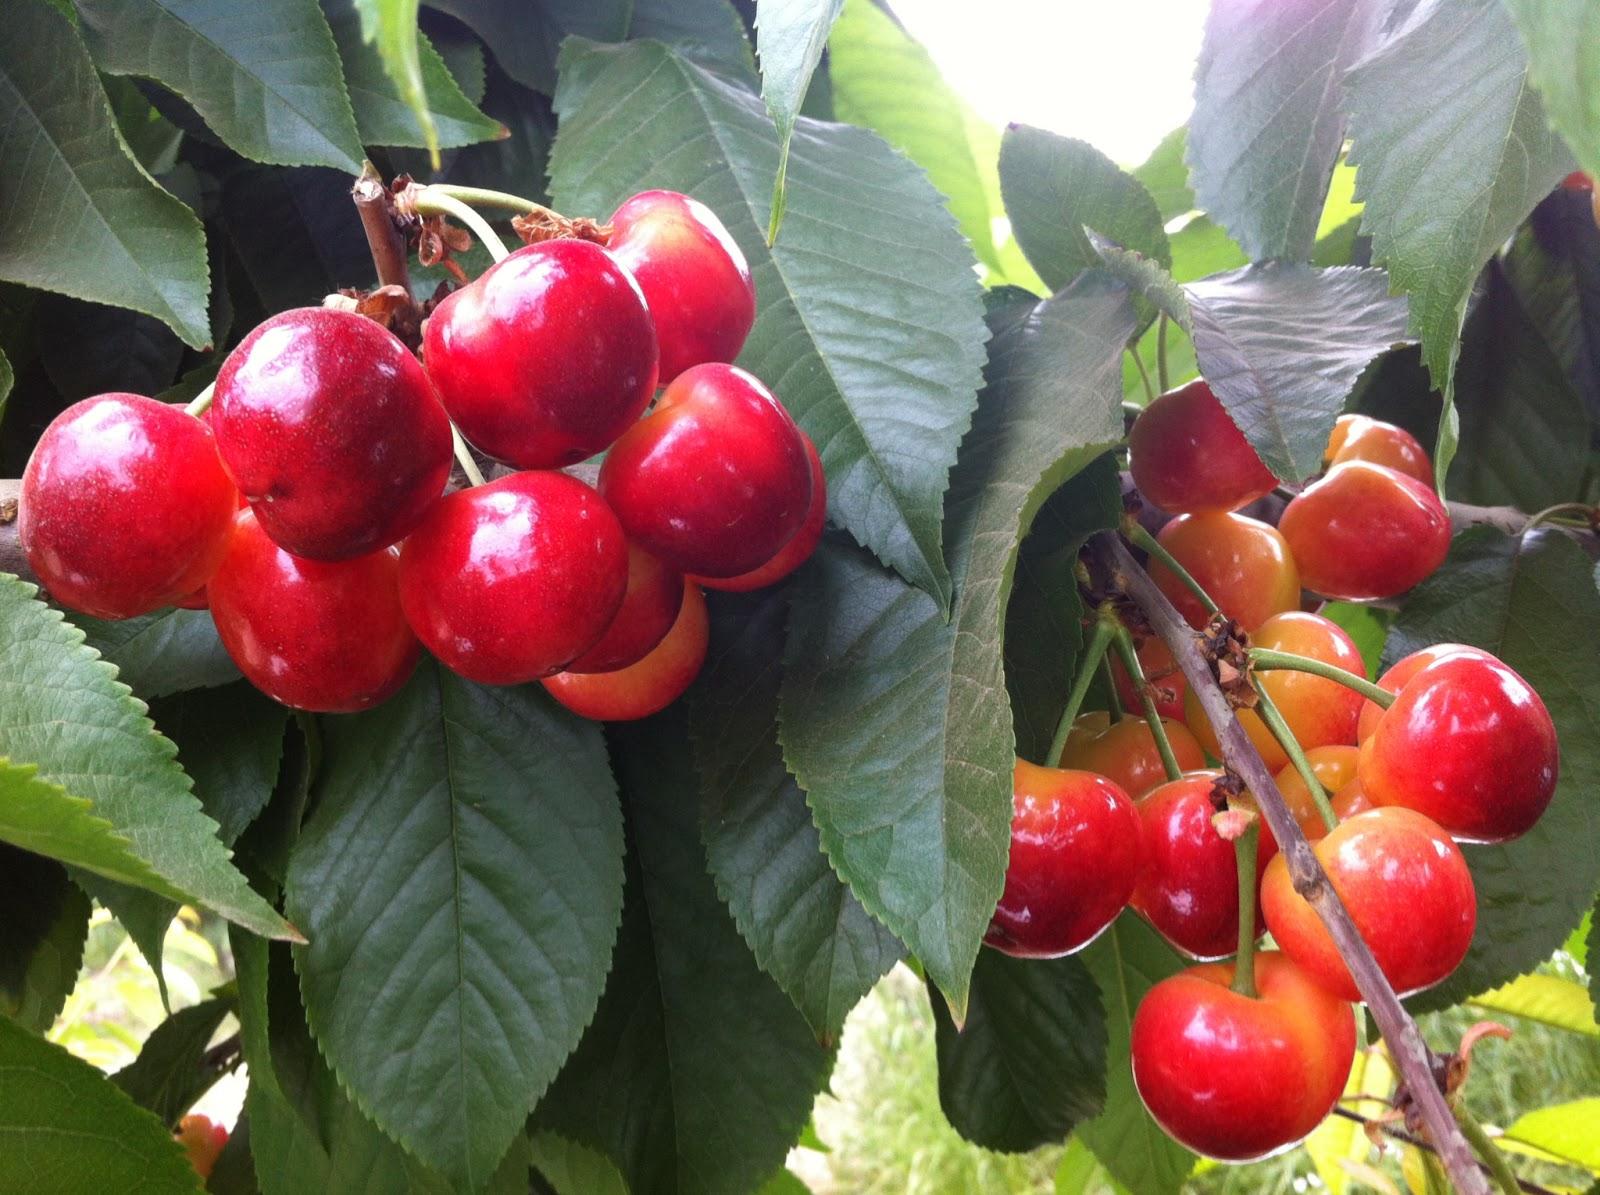 produce clerk the produce clerks handbook by rick chong how to handle rainier cherries